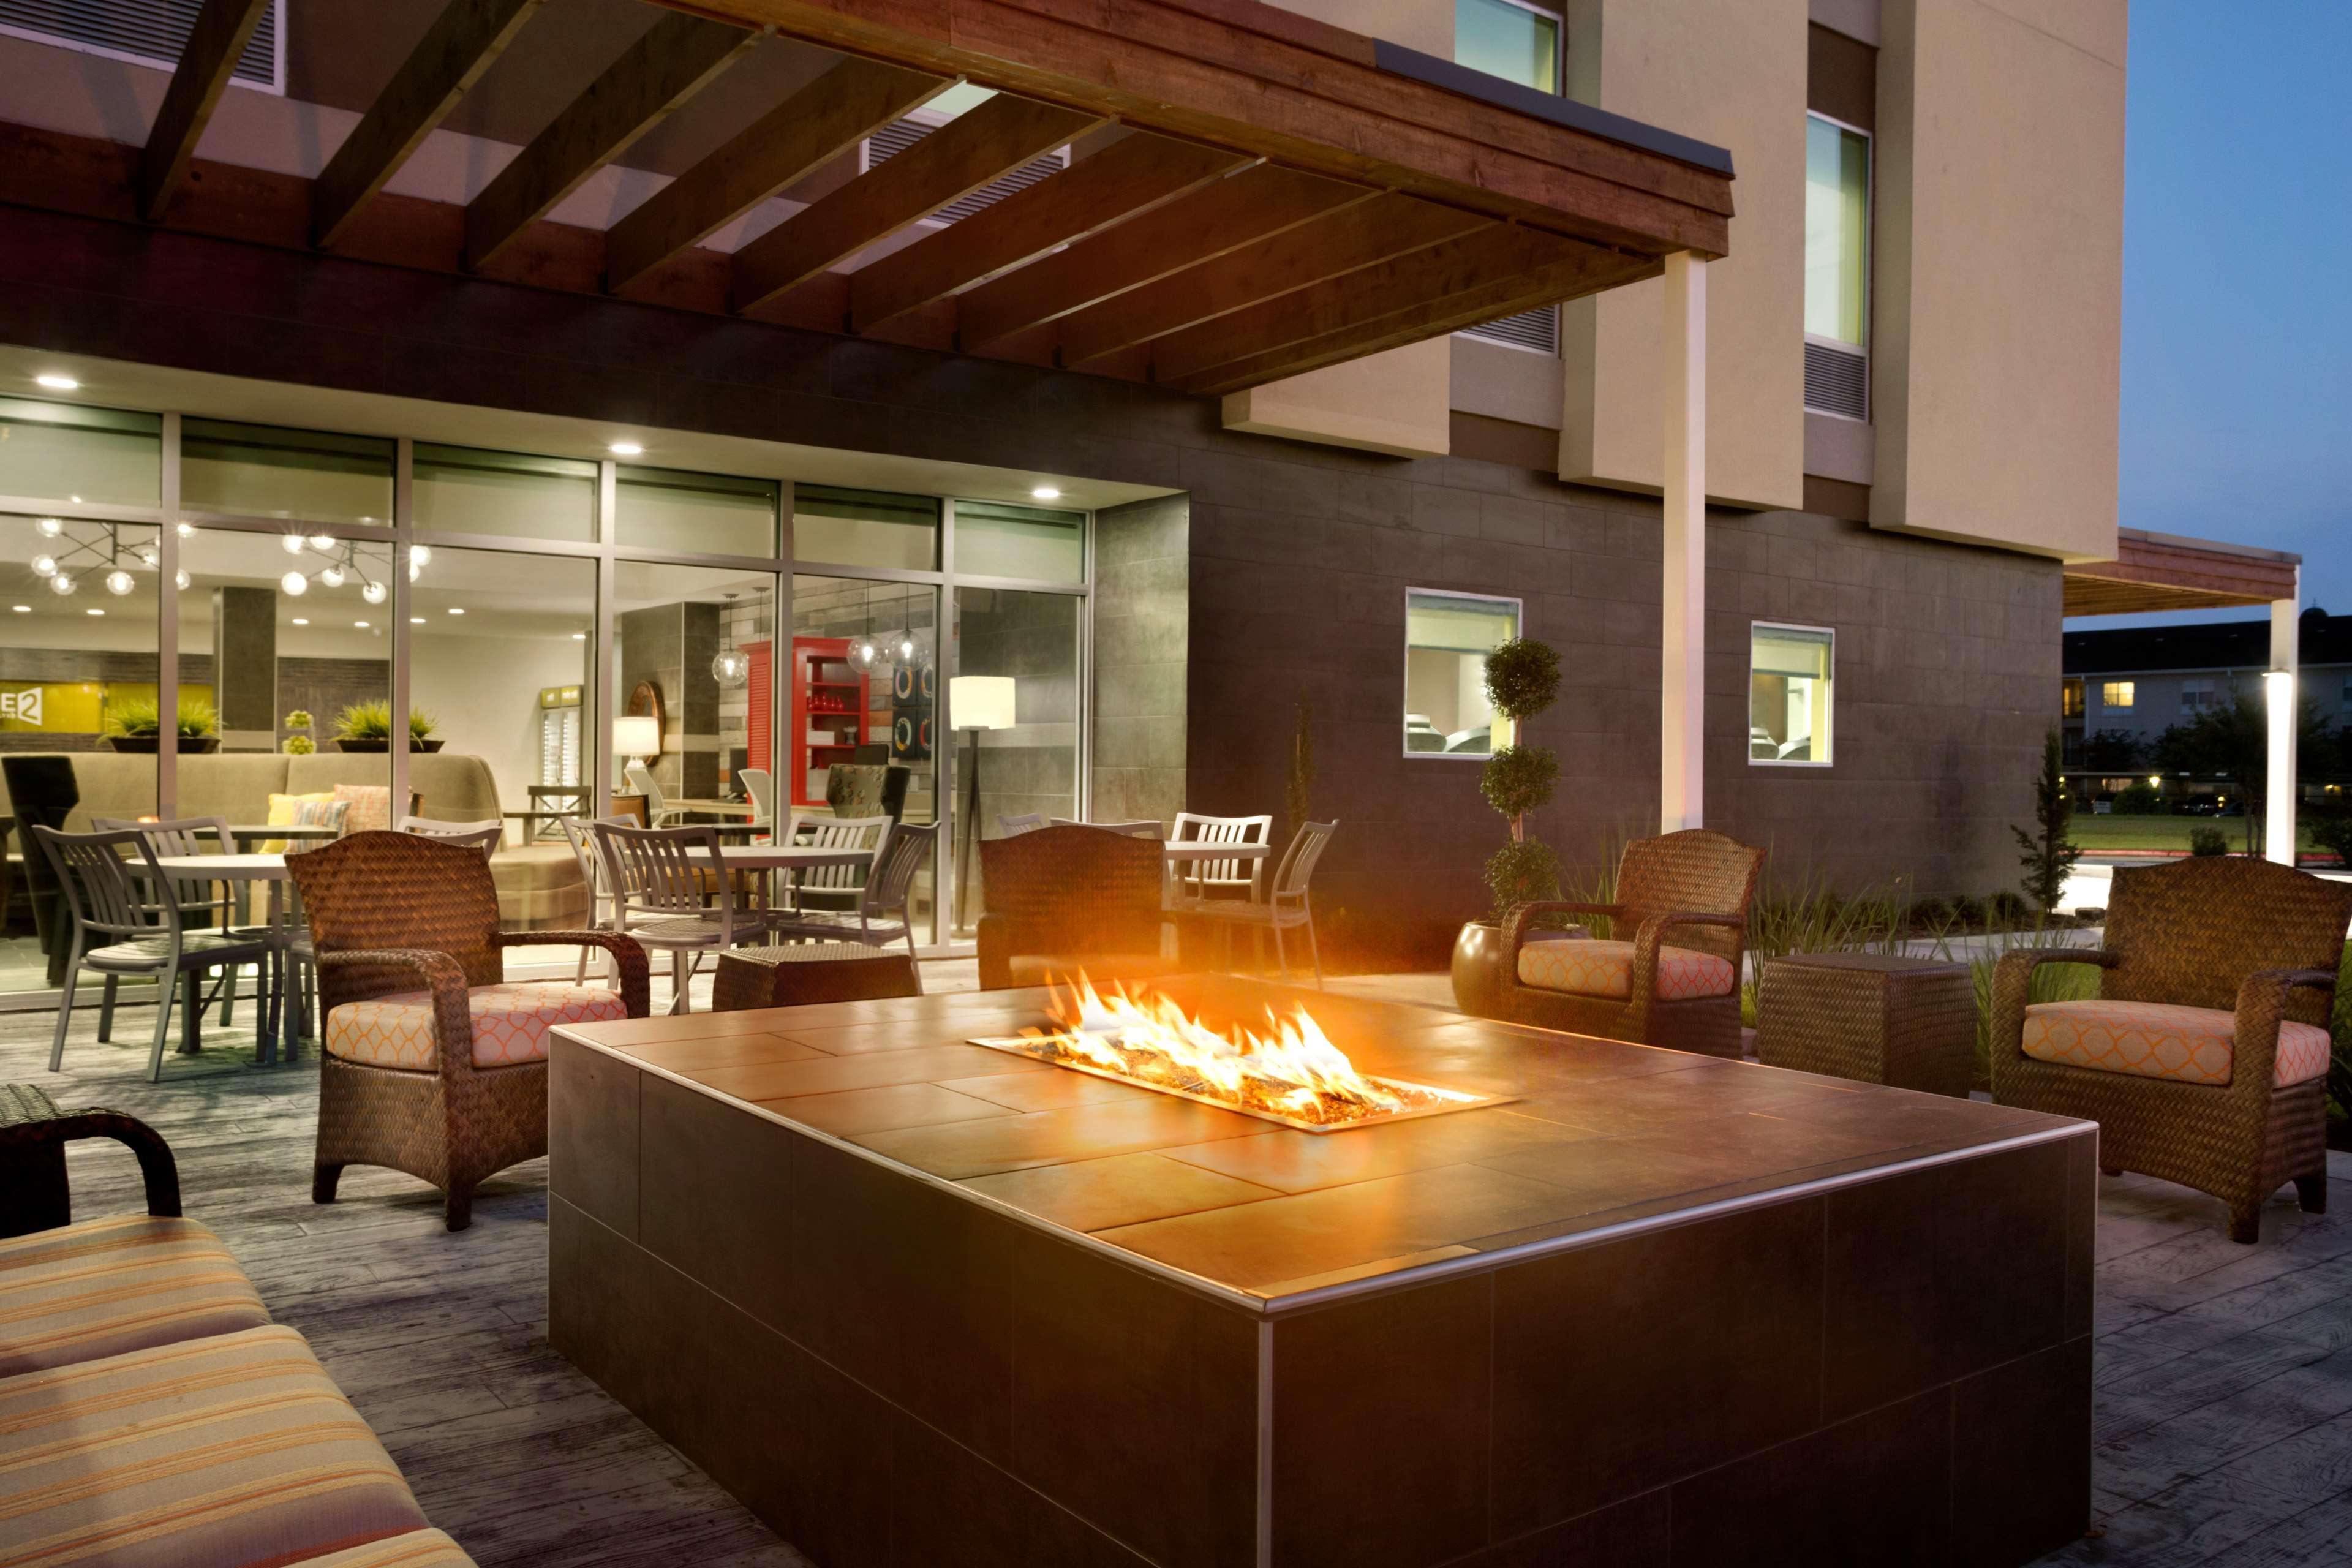 Home2 Suites by Hilton Houston/Webster image 3